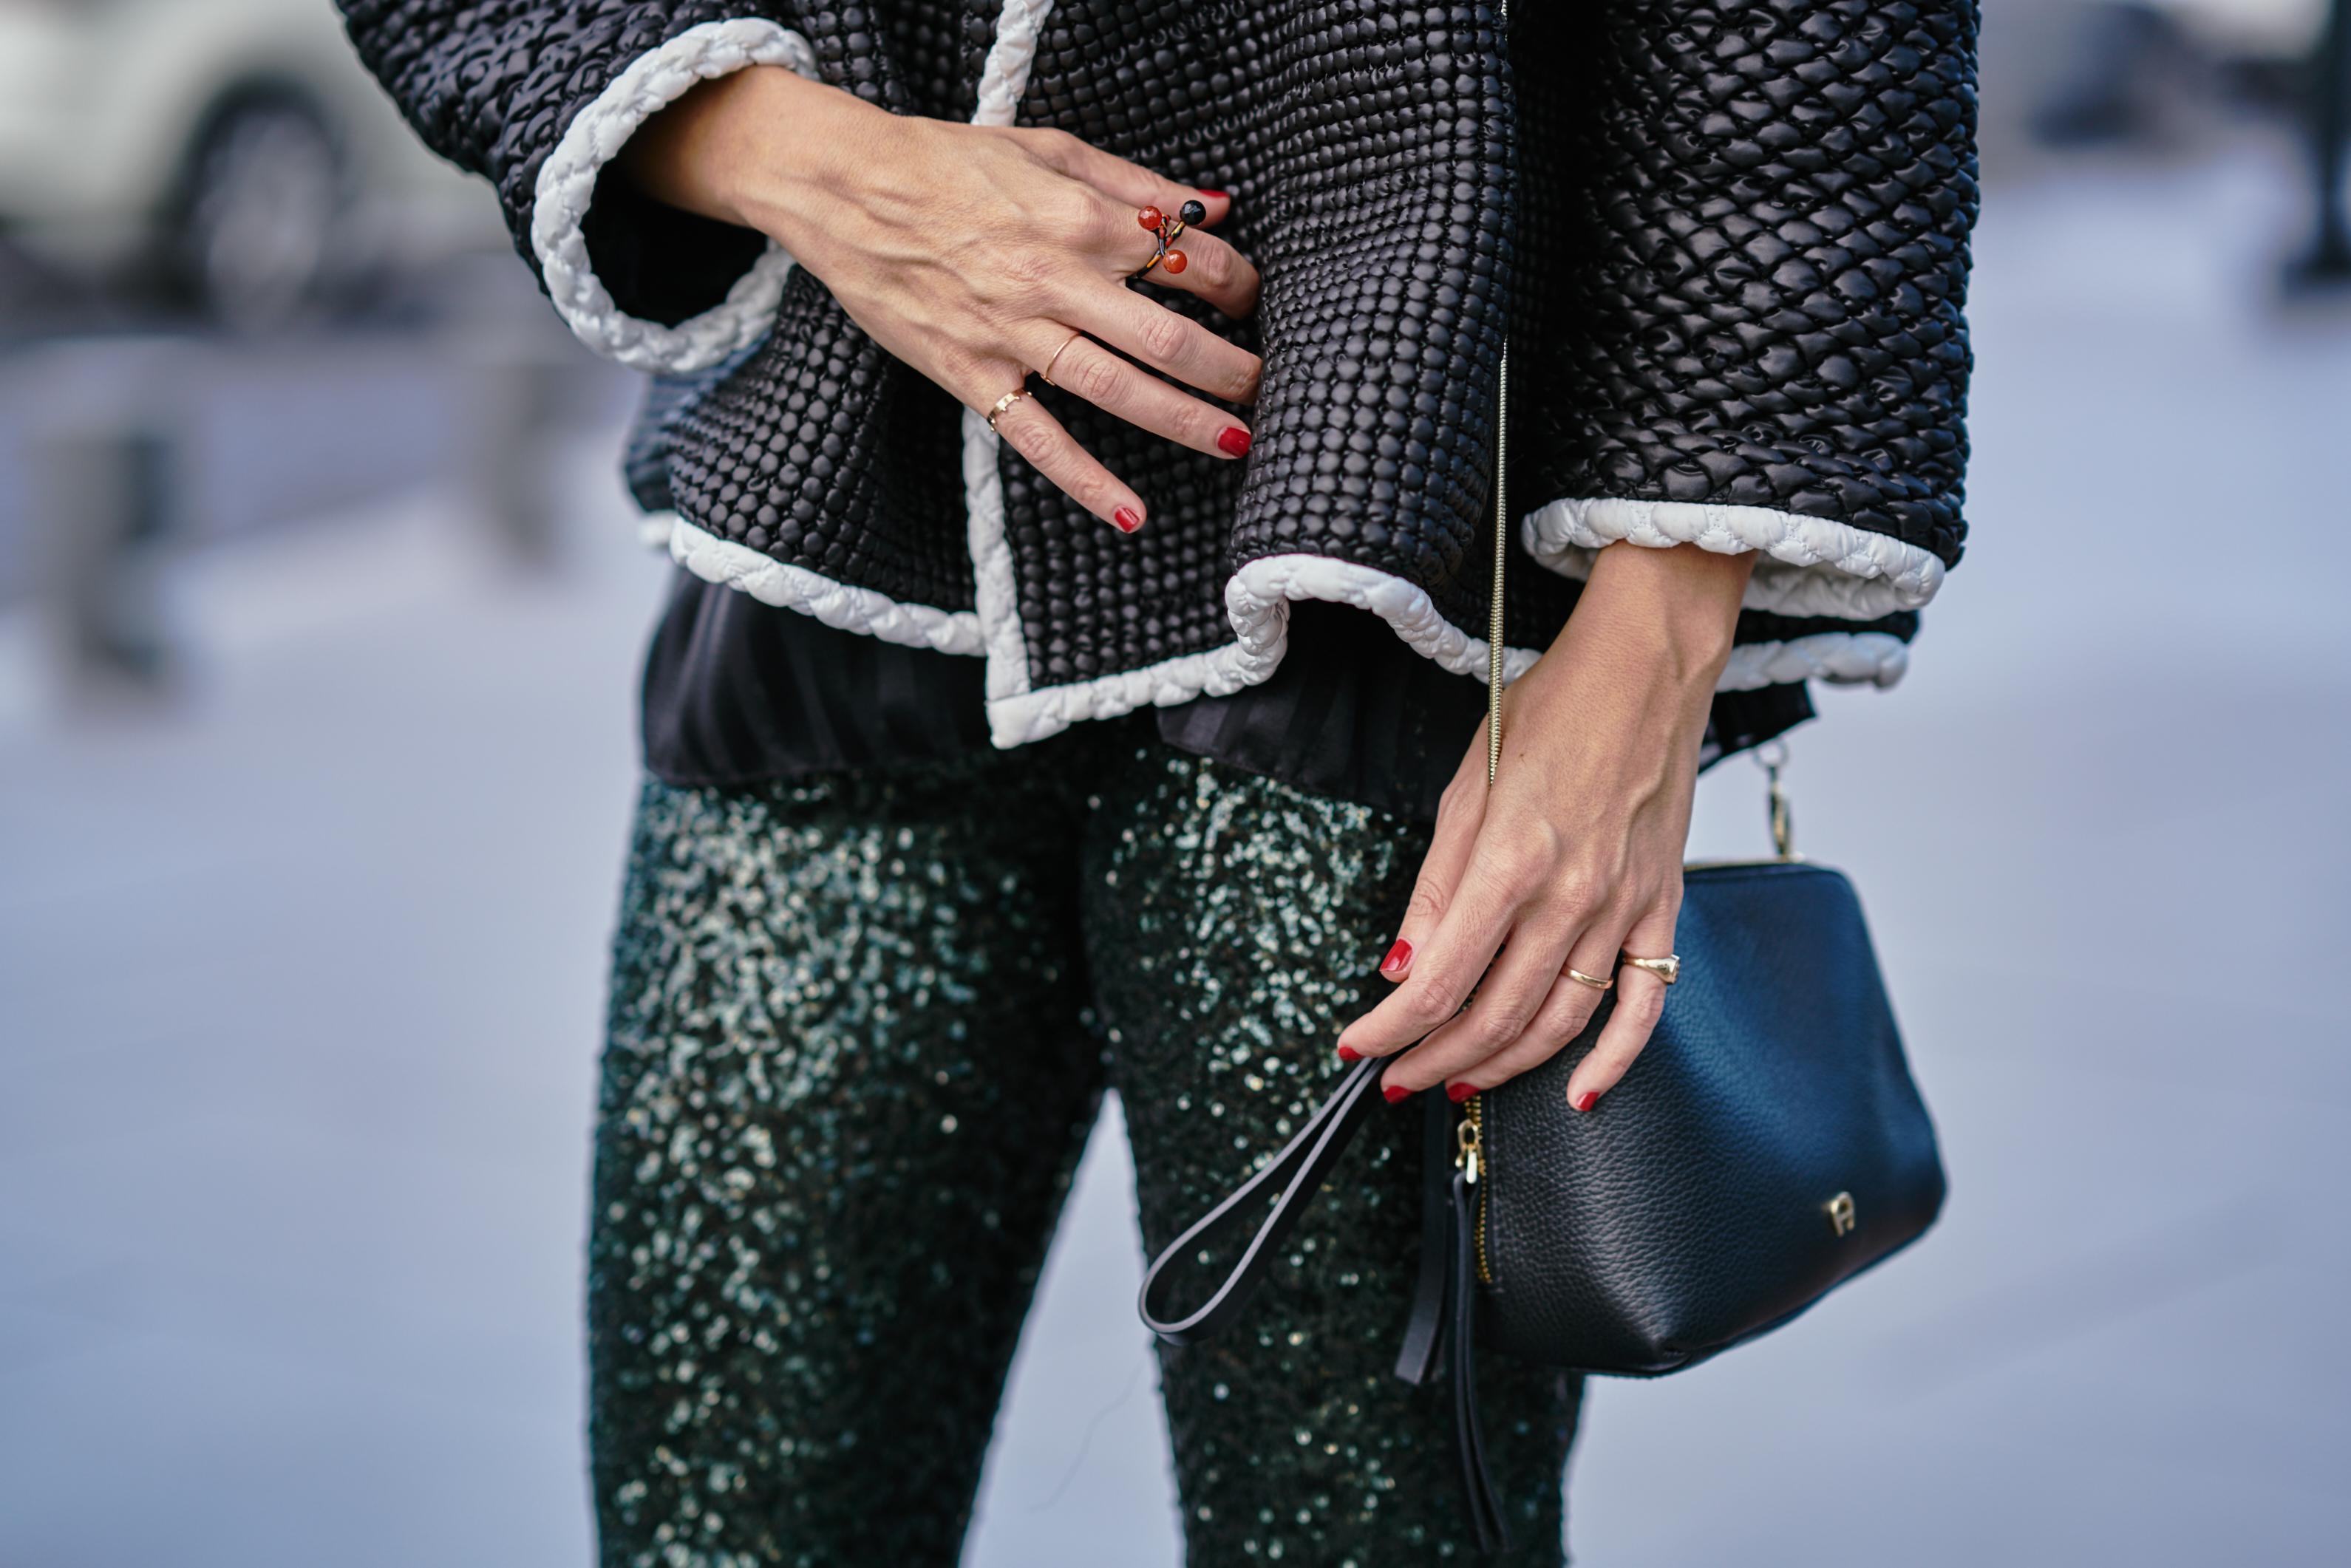 billur saatci, offnegiysem, street style, turkish style blogger, mbfwi, mercedes-benz fashion week istanbul, istanbul moda haftası, ne giydim, ootd, fey, nike hurache, marni, lug von siga, aigner, uterque, nike women, ntc, hekayat